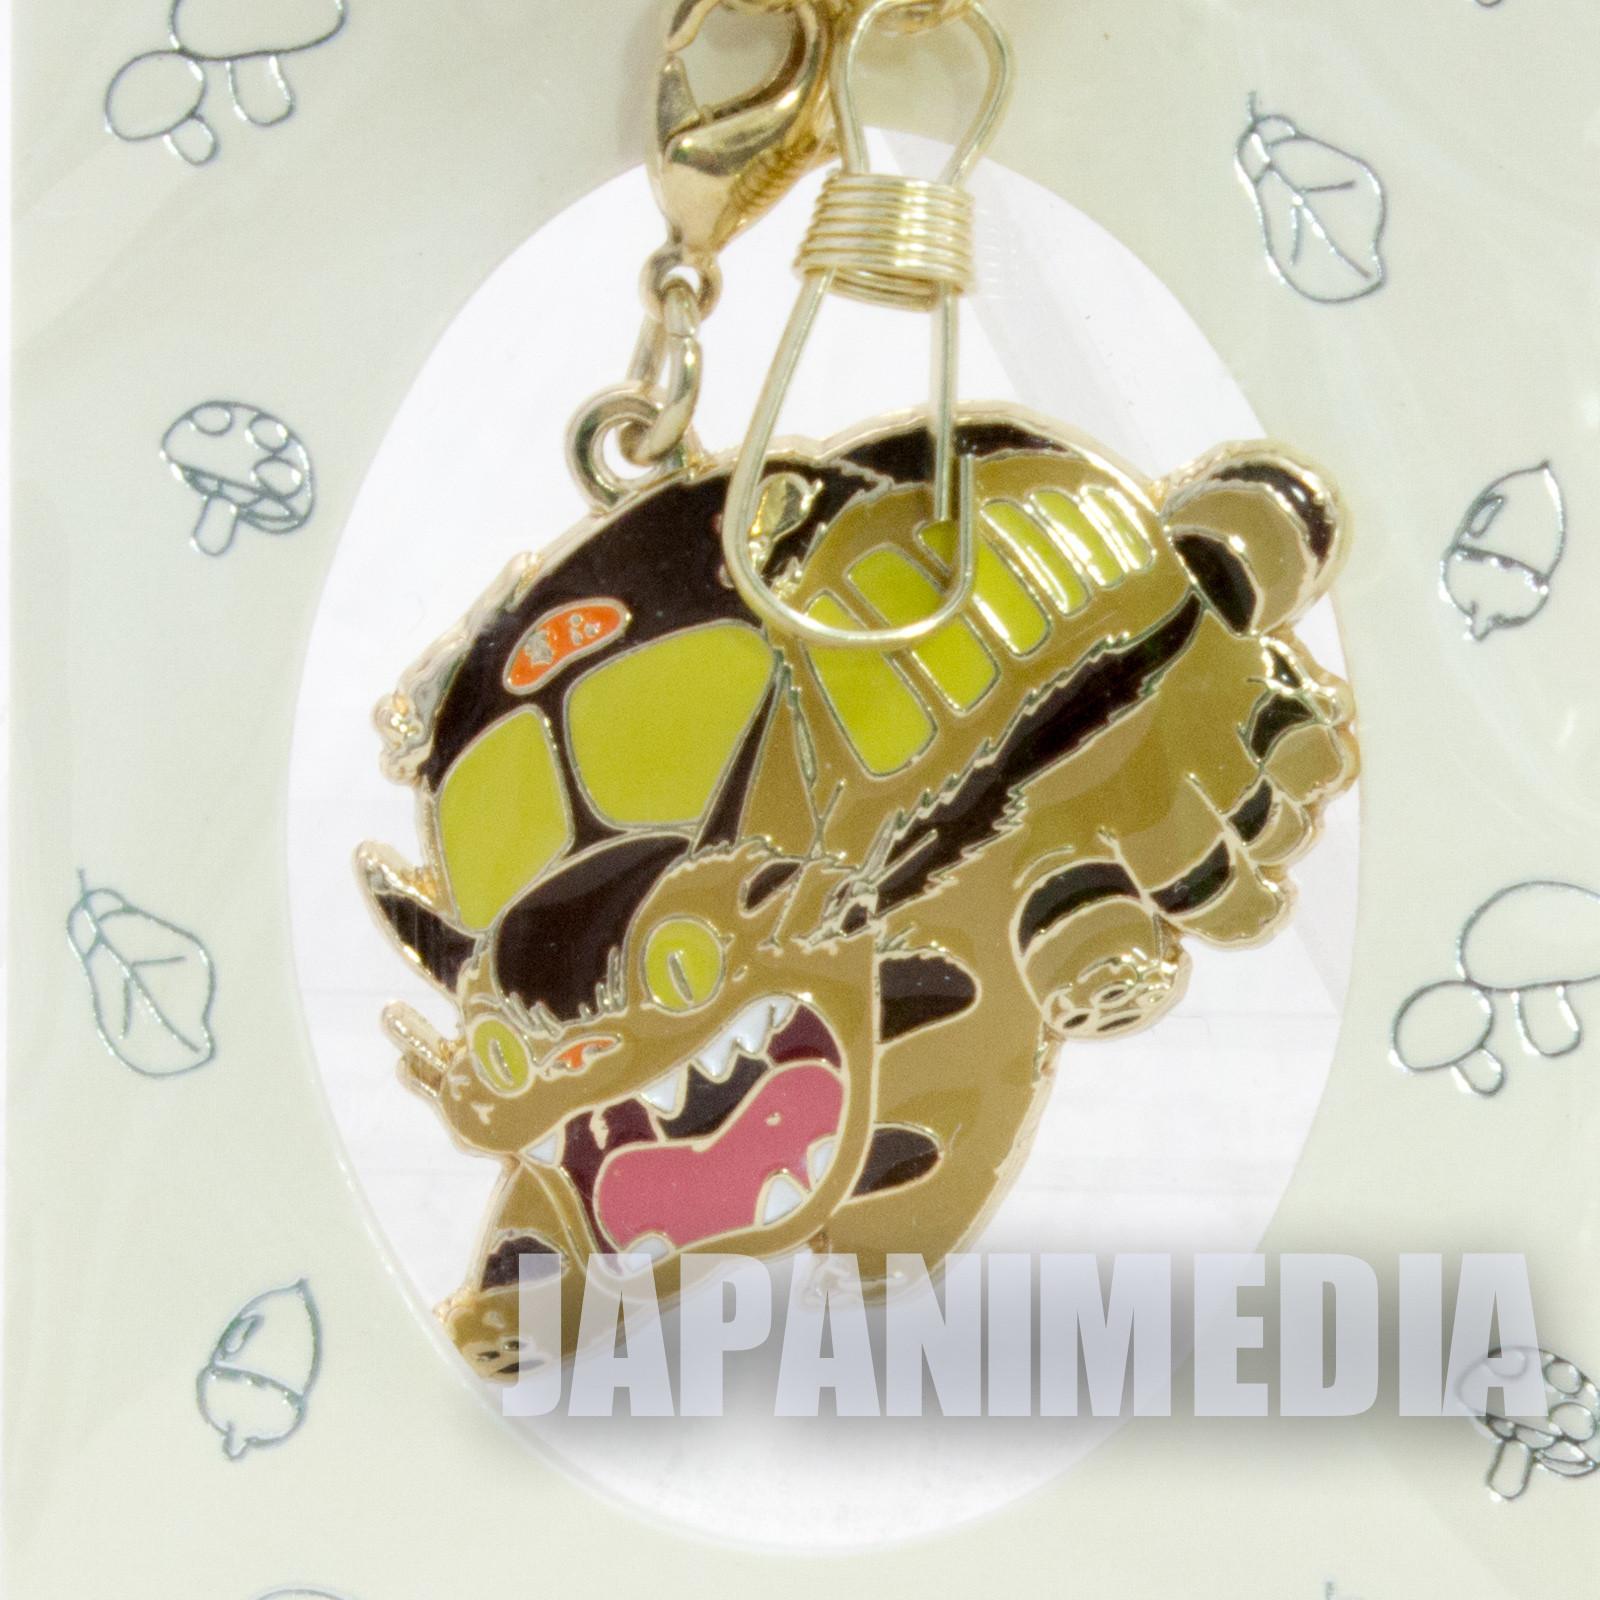 My Neighbor Totoro Mascot Charm Key Ring #5 Catbus Ghibli Hayao Miyazaki